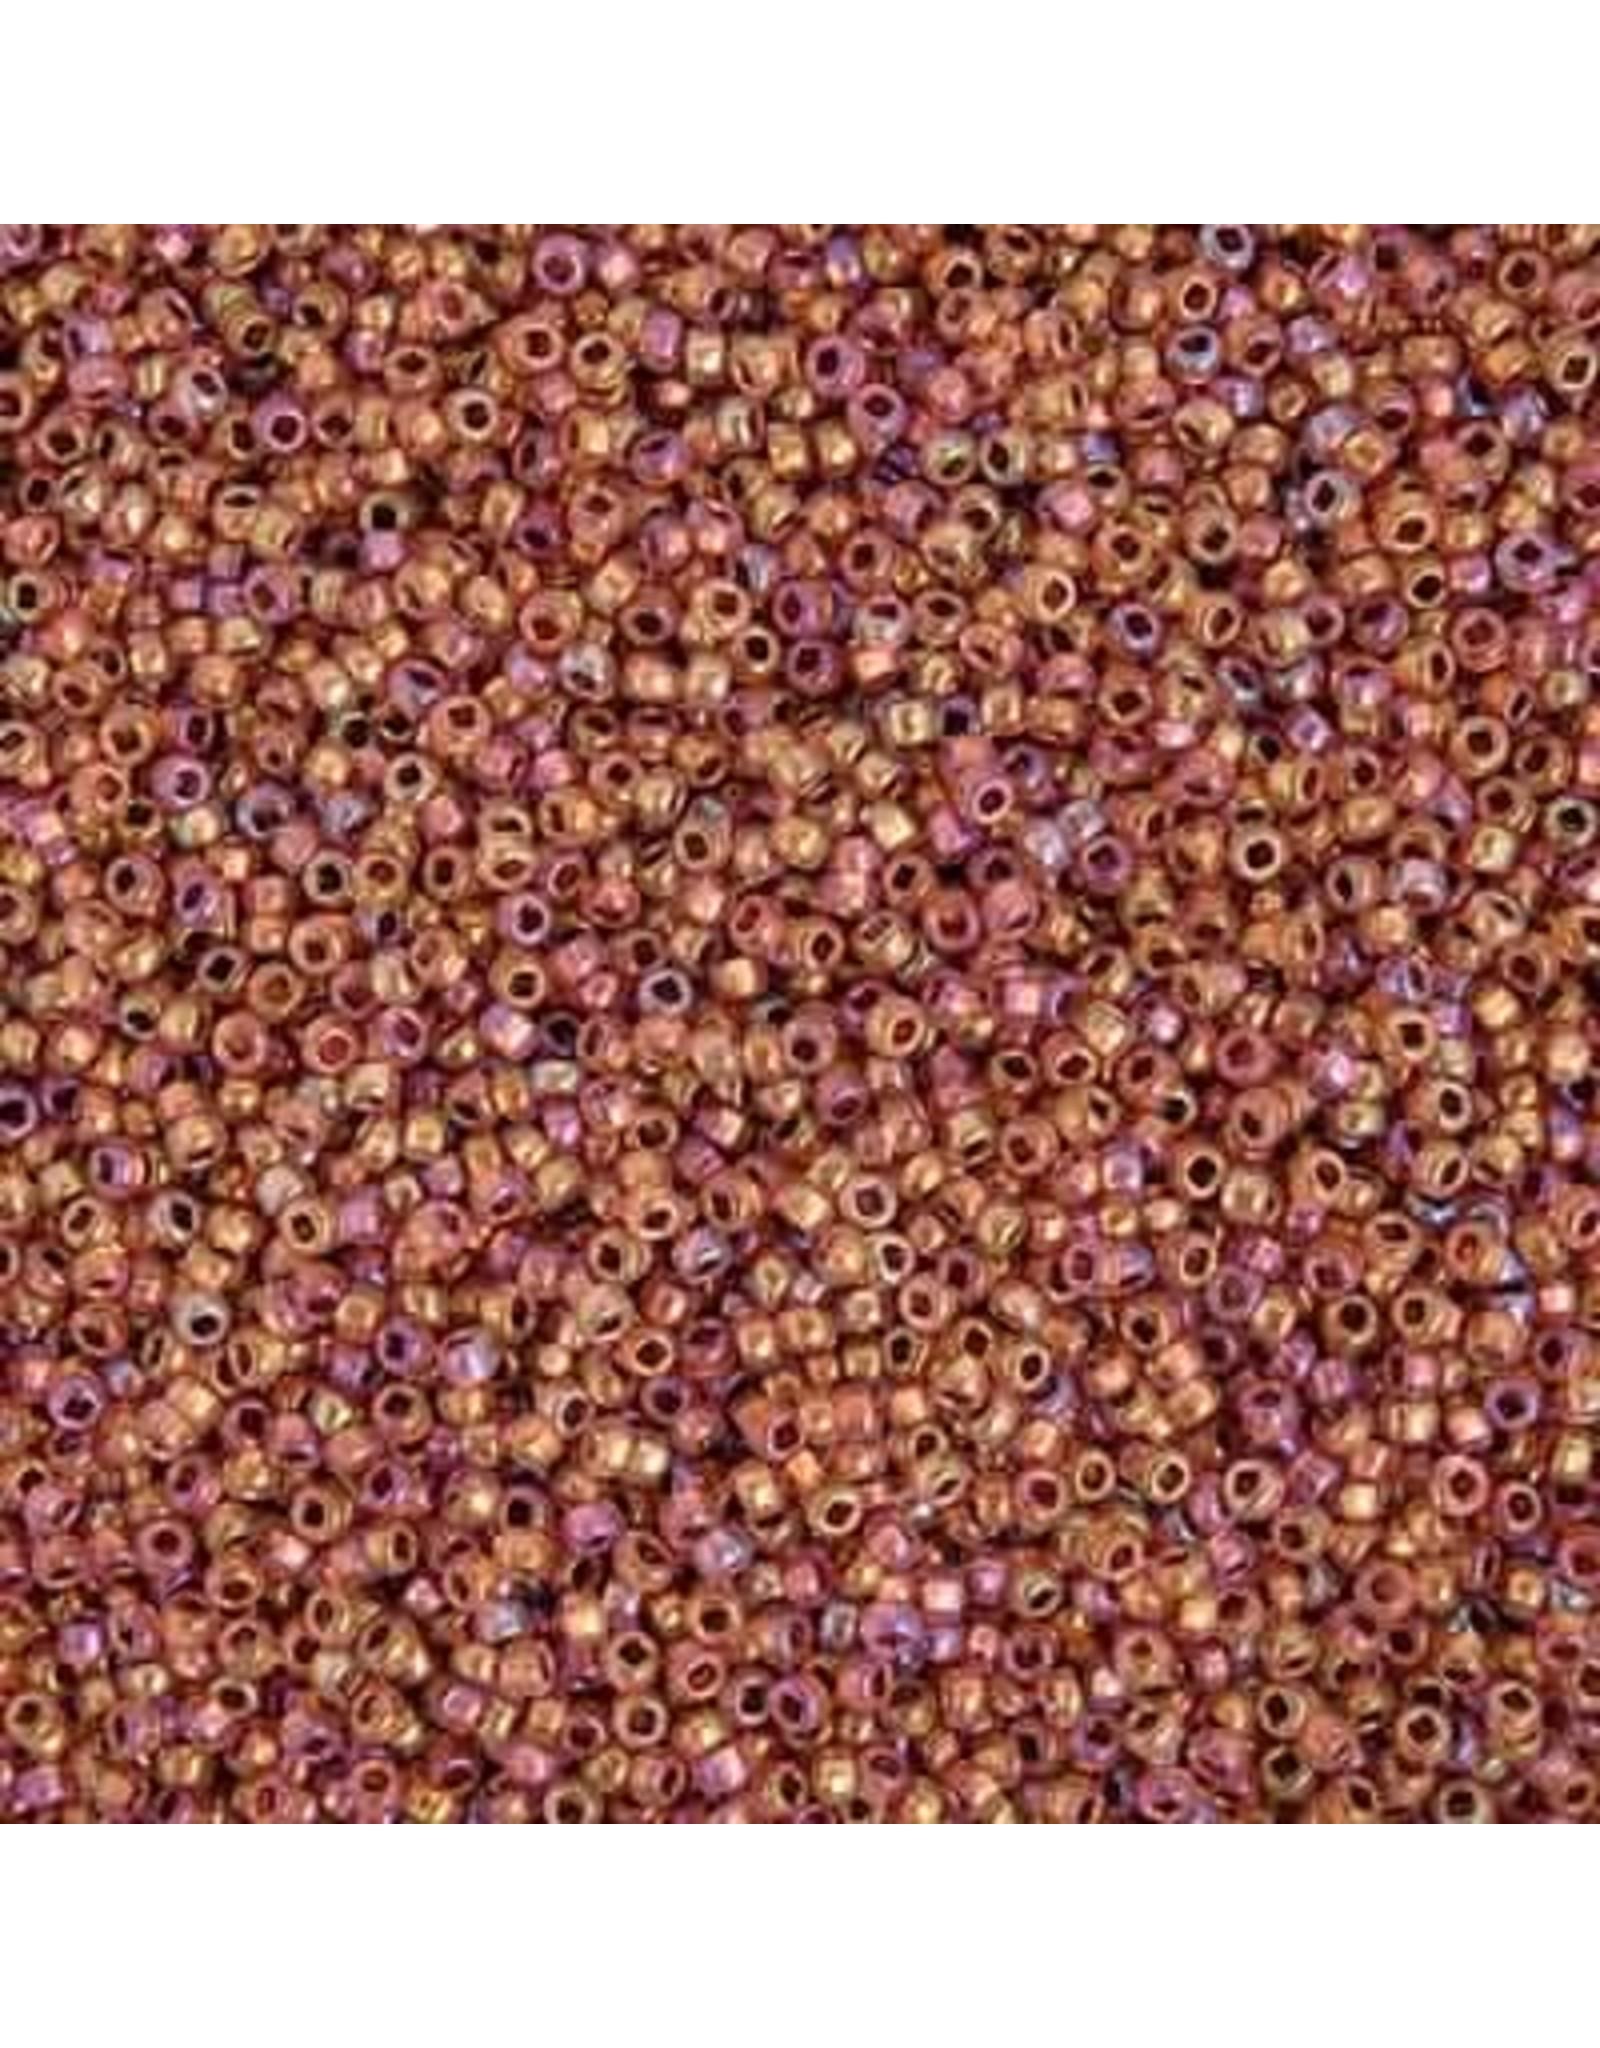 Czech 40039 10   Seed 20g Pink AB cp/l  s/g